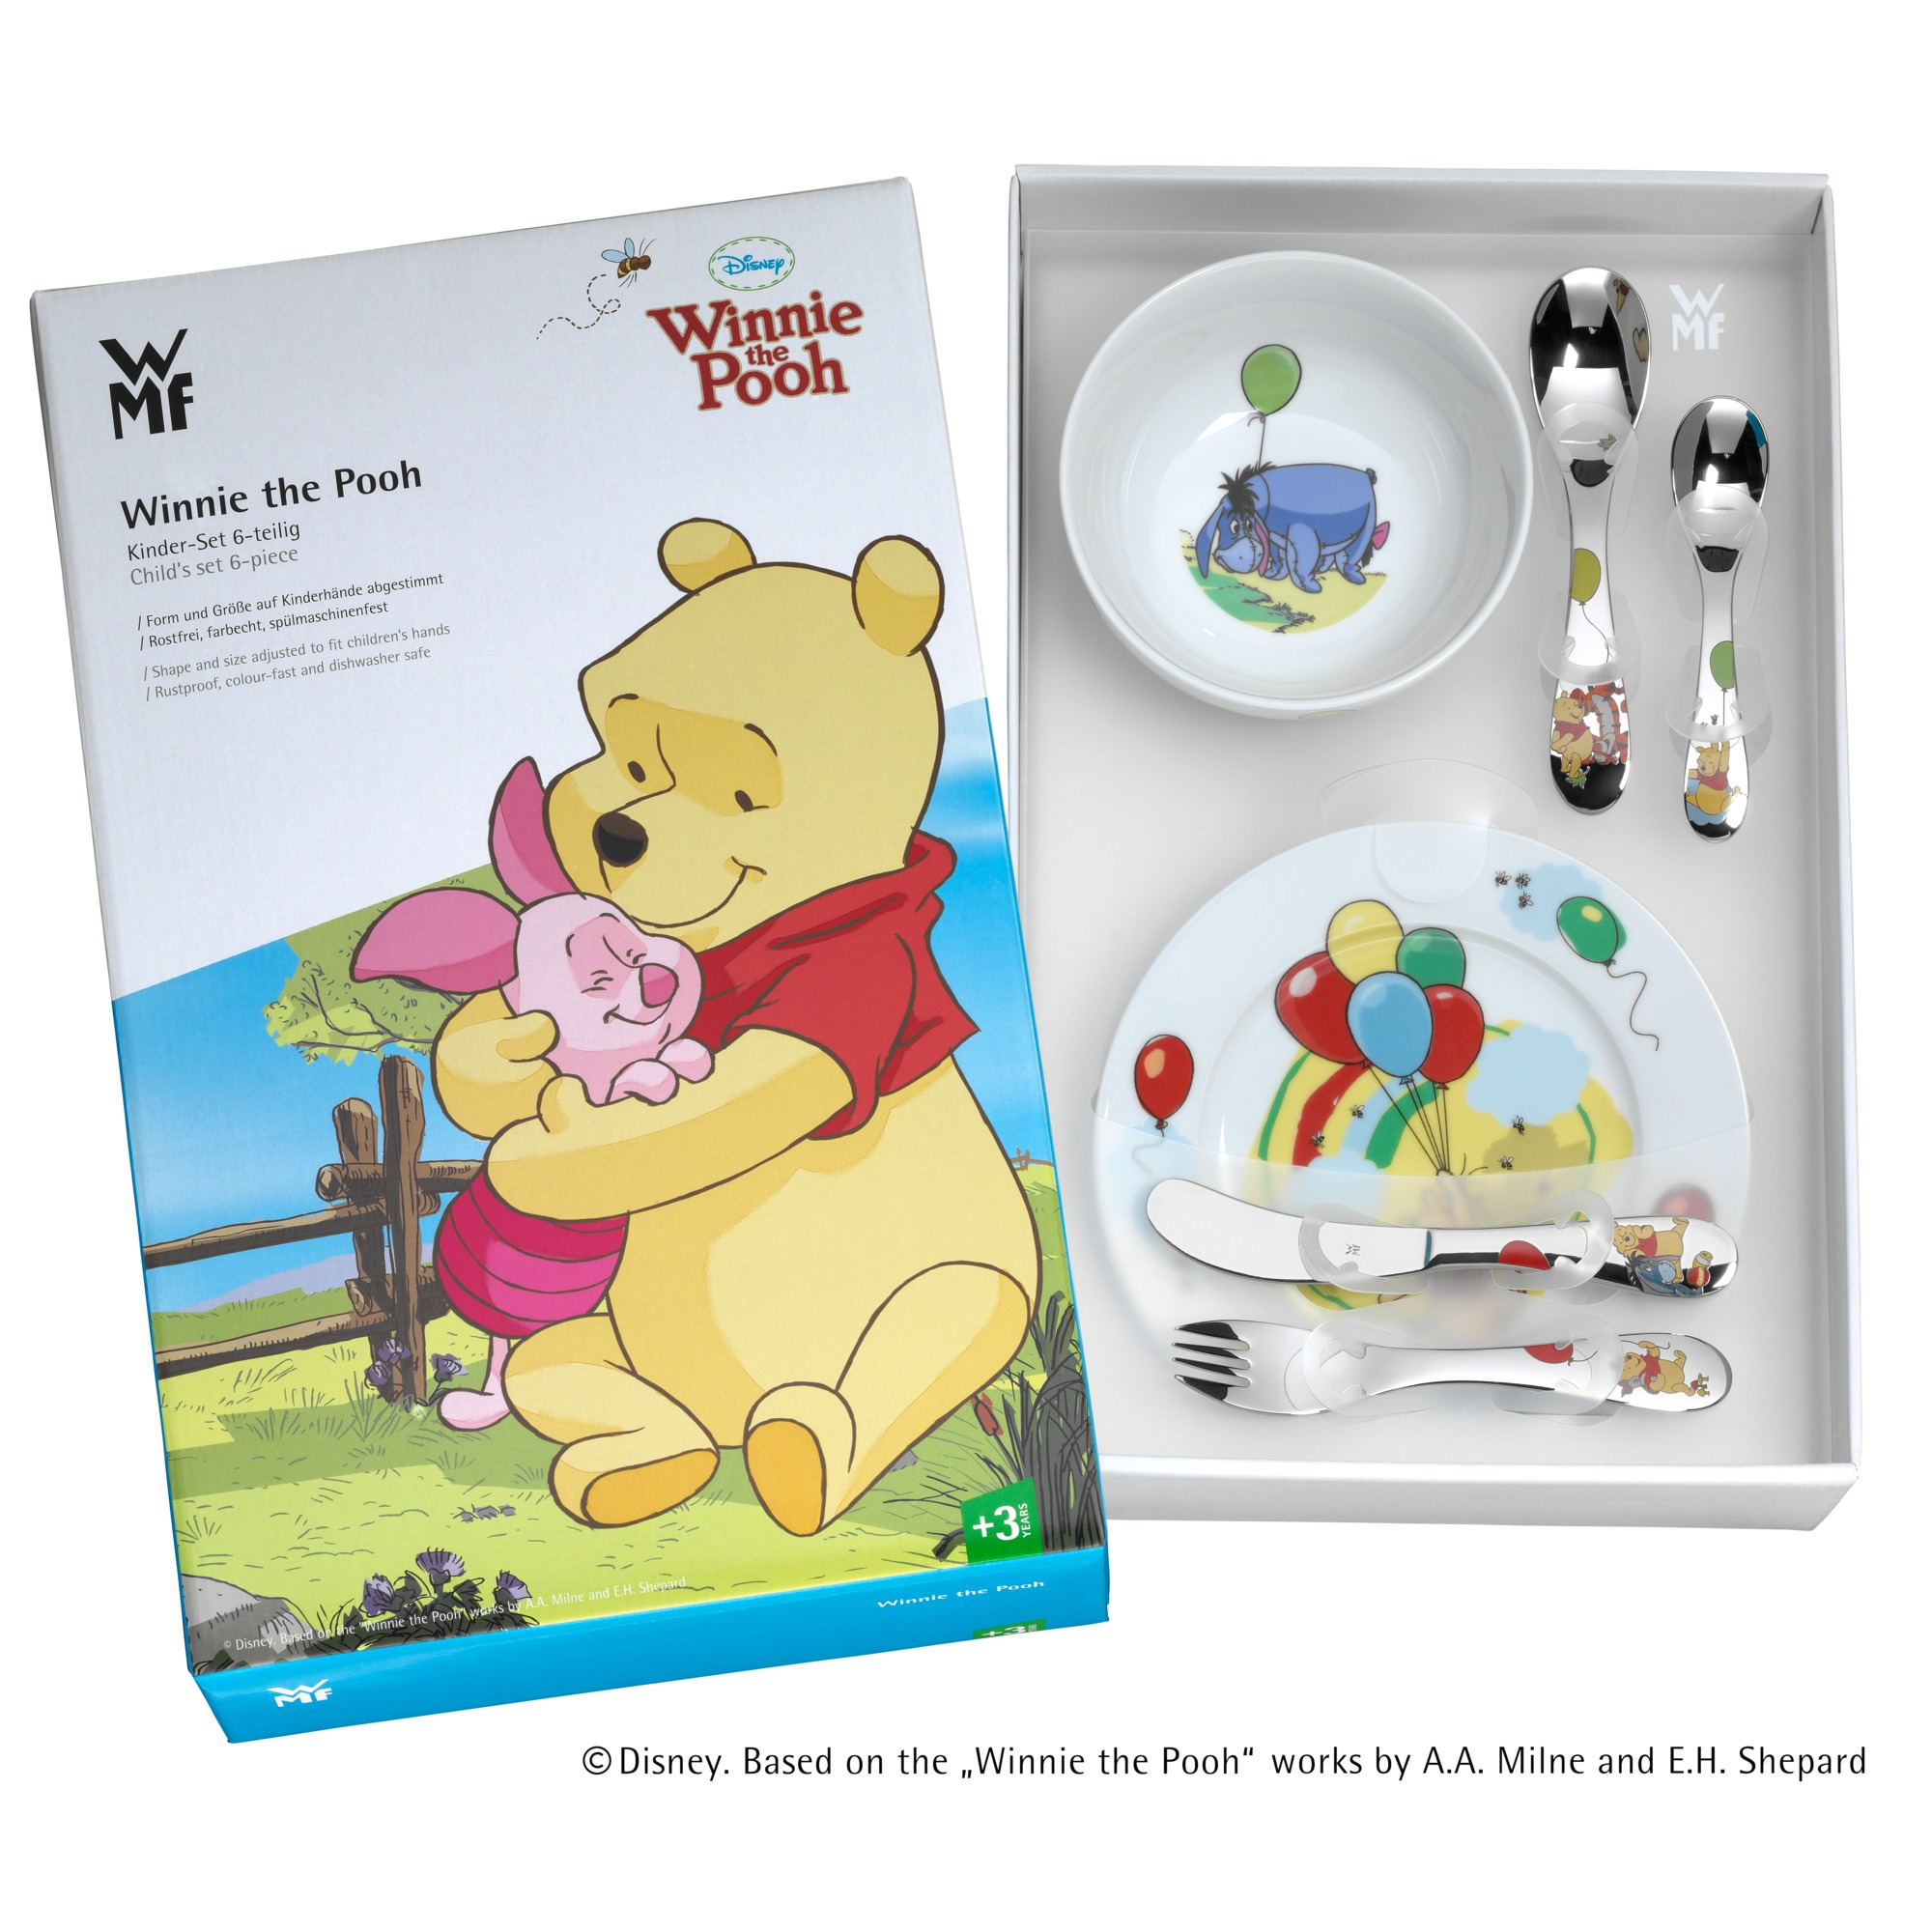 WMF Çocuk Yemek Seti Winnie The Pooh